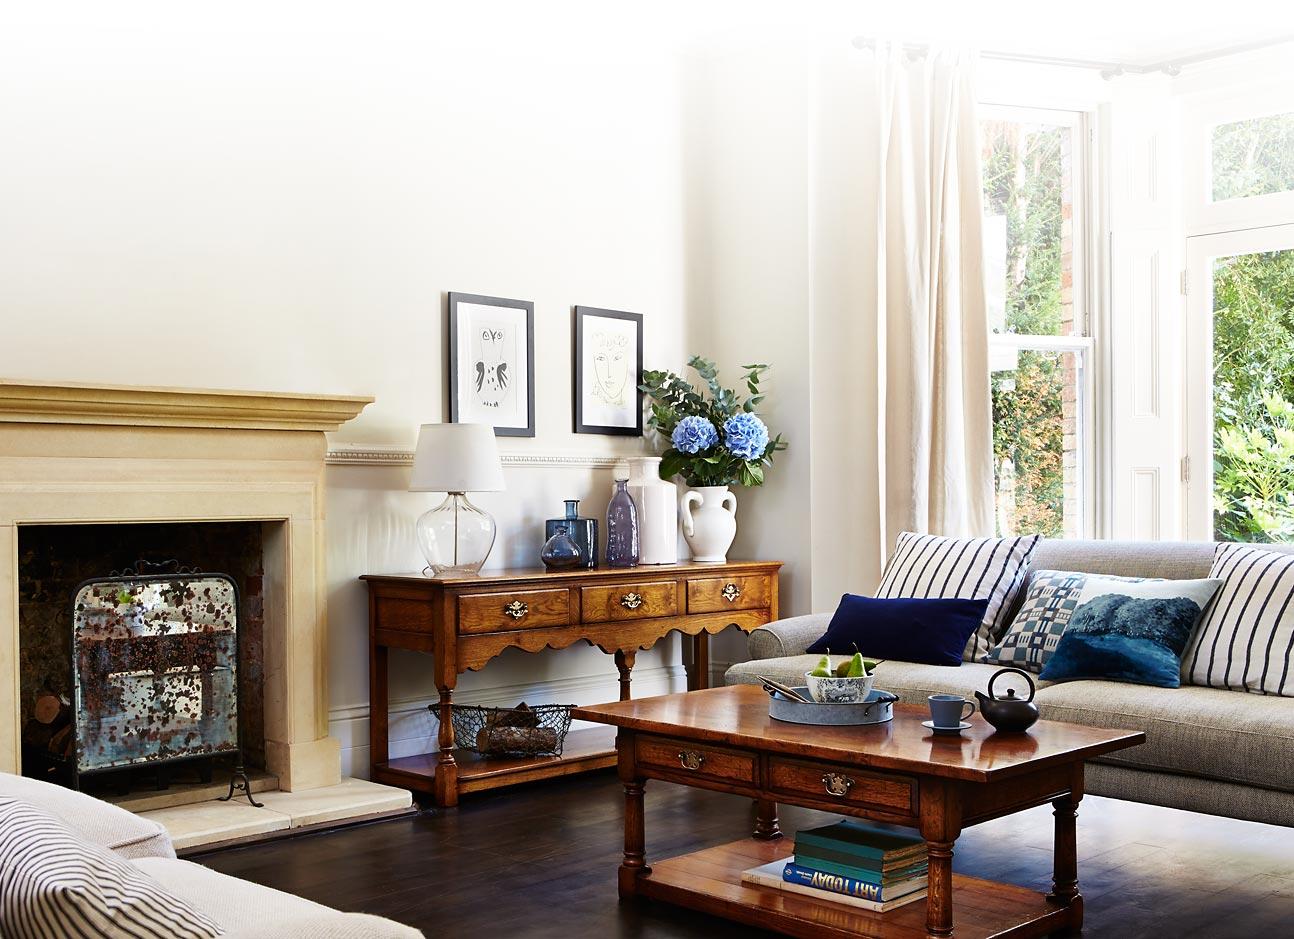 handmade furniture fine furniture titchmarsh goodwin. Black Bedroom Furniture Sets. Home Design Ideas